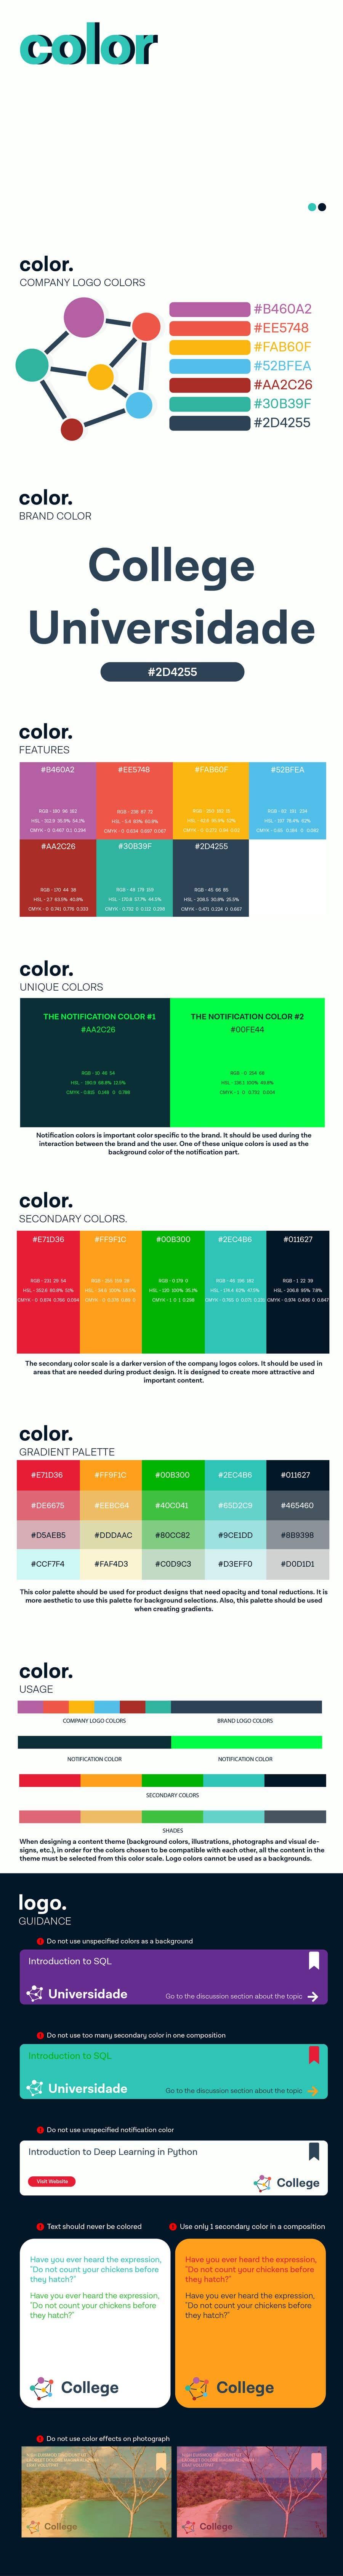 Penyertaan Peraduan #                                        202                                      untuk                                         Complete Brand Book, Company Design Guideline